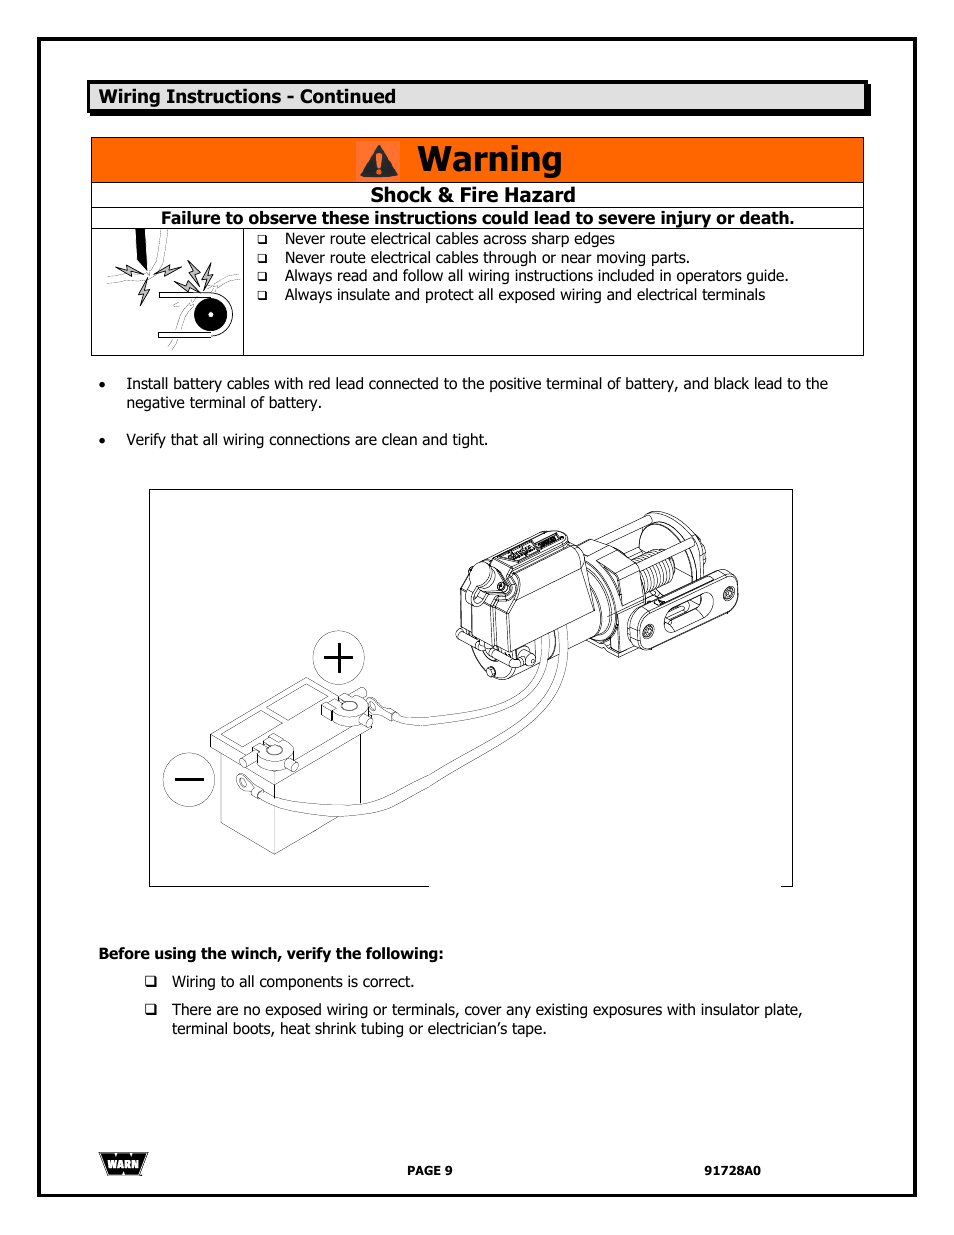 Aluminum Wiring A Fire Hazard Manual Guide